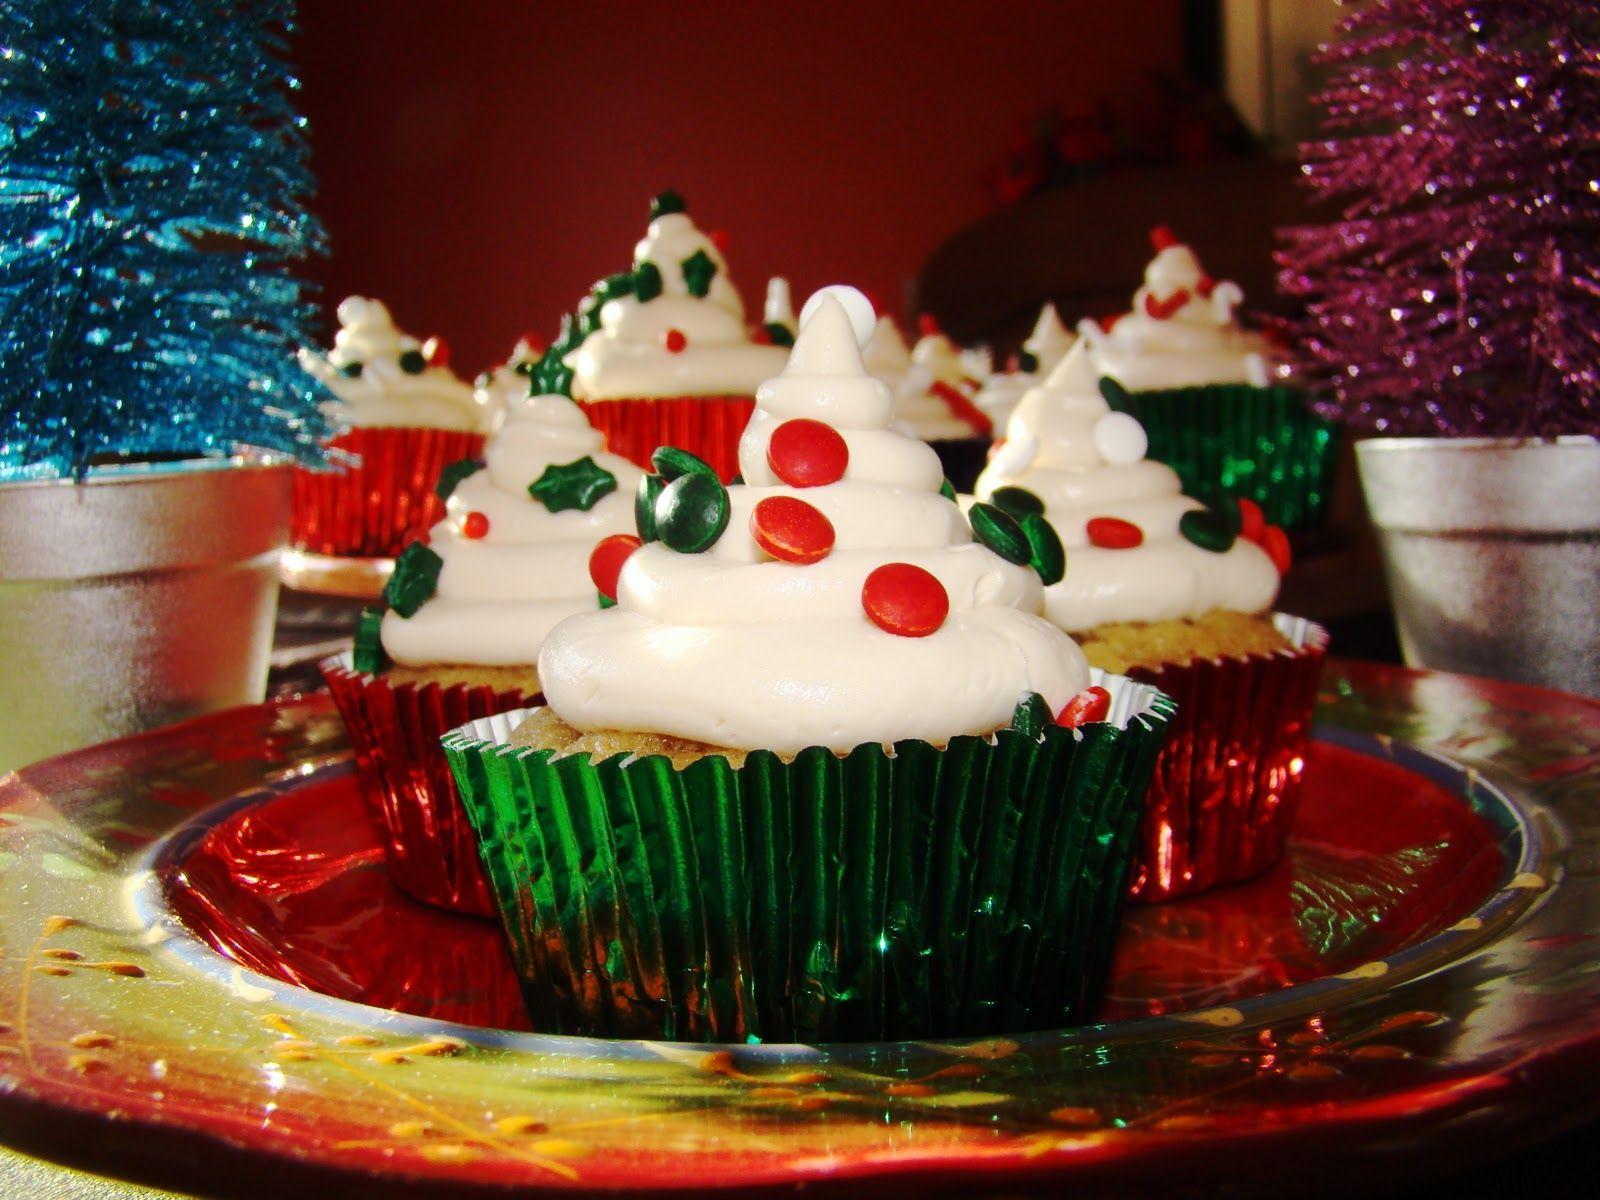 Applesauce cupcakes with salted caramel buttercream